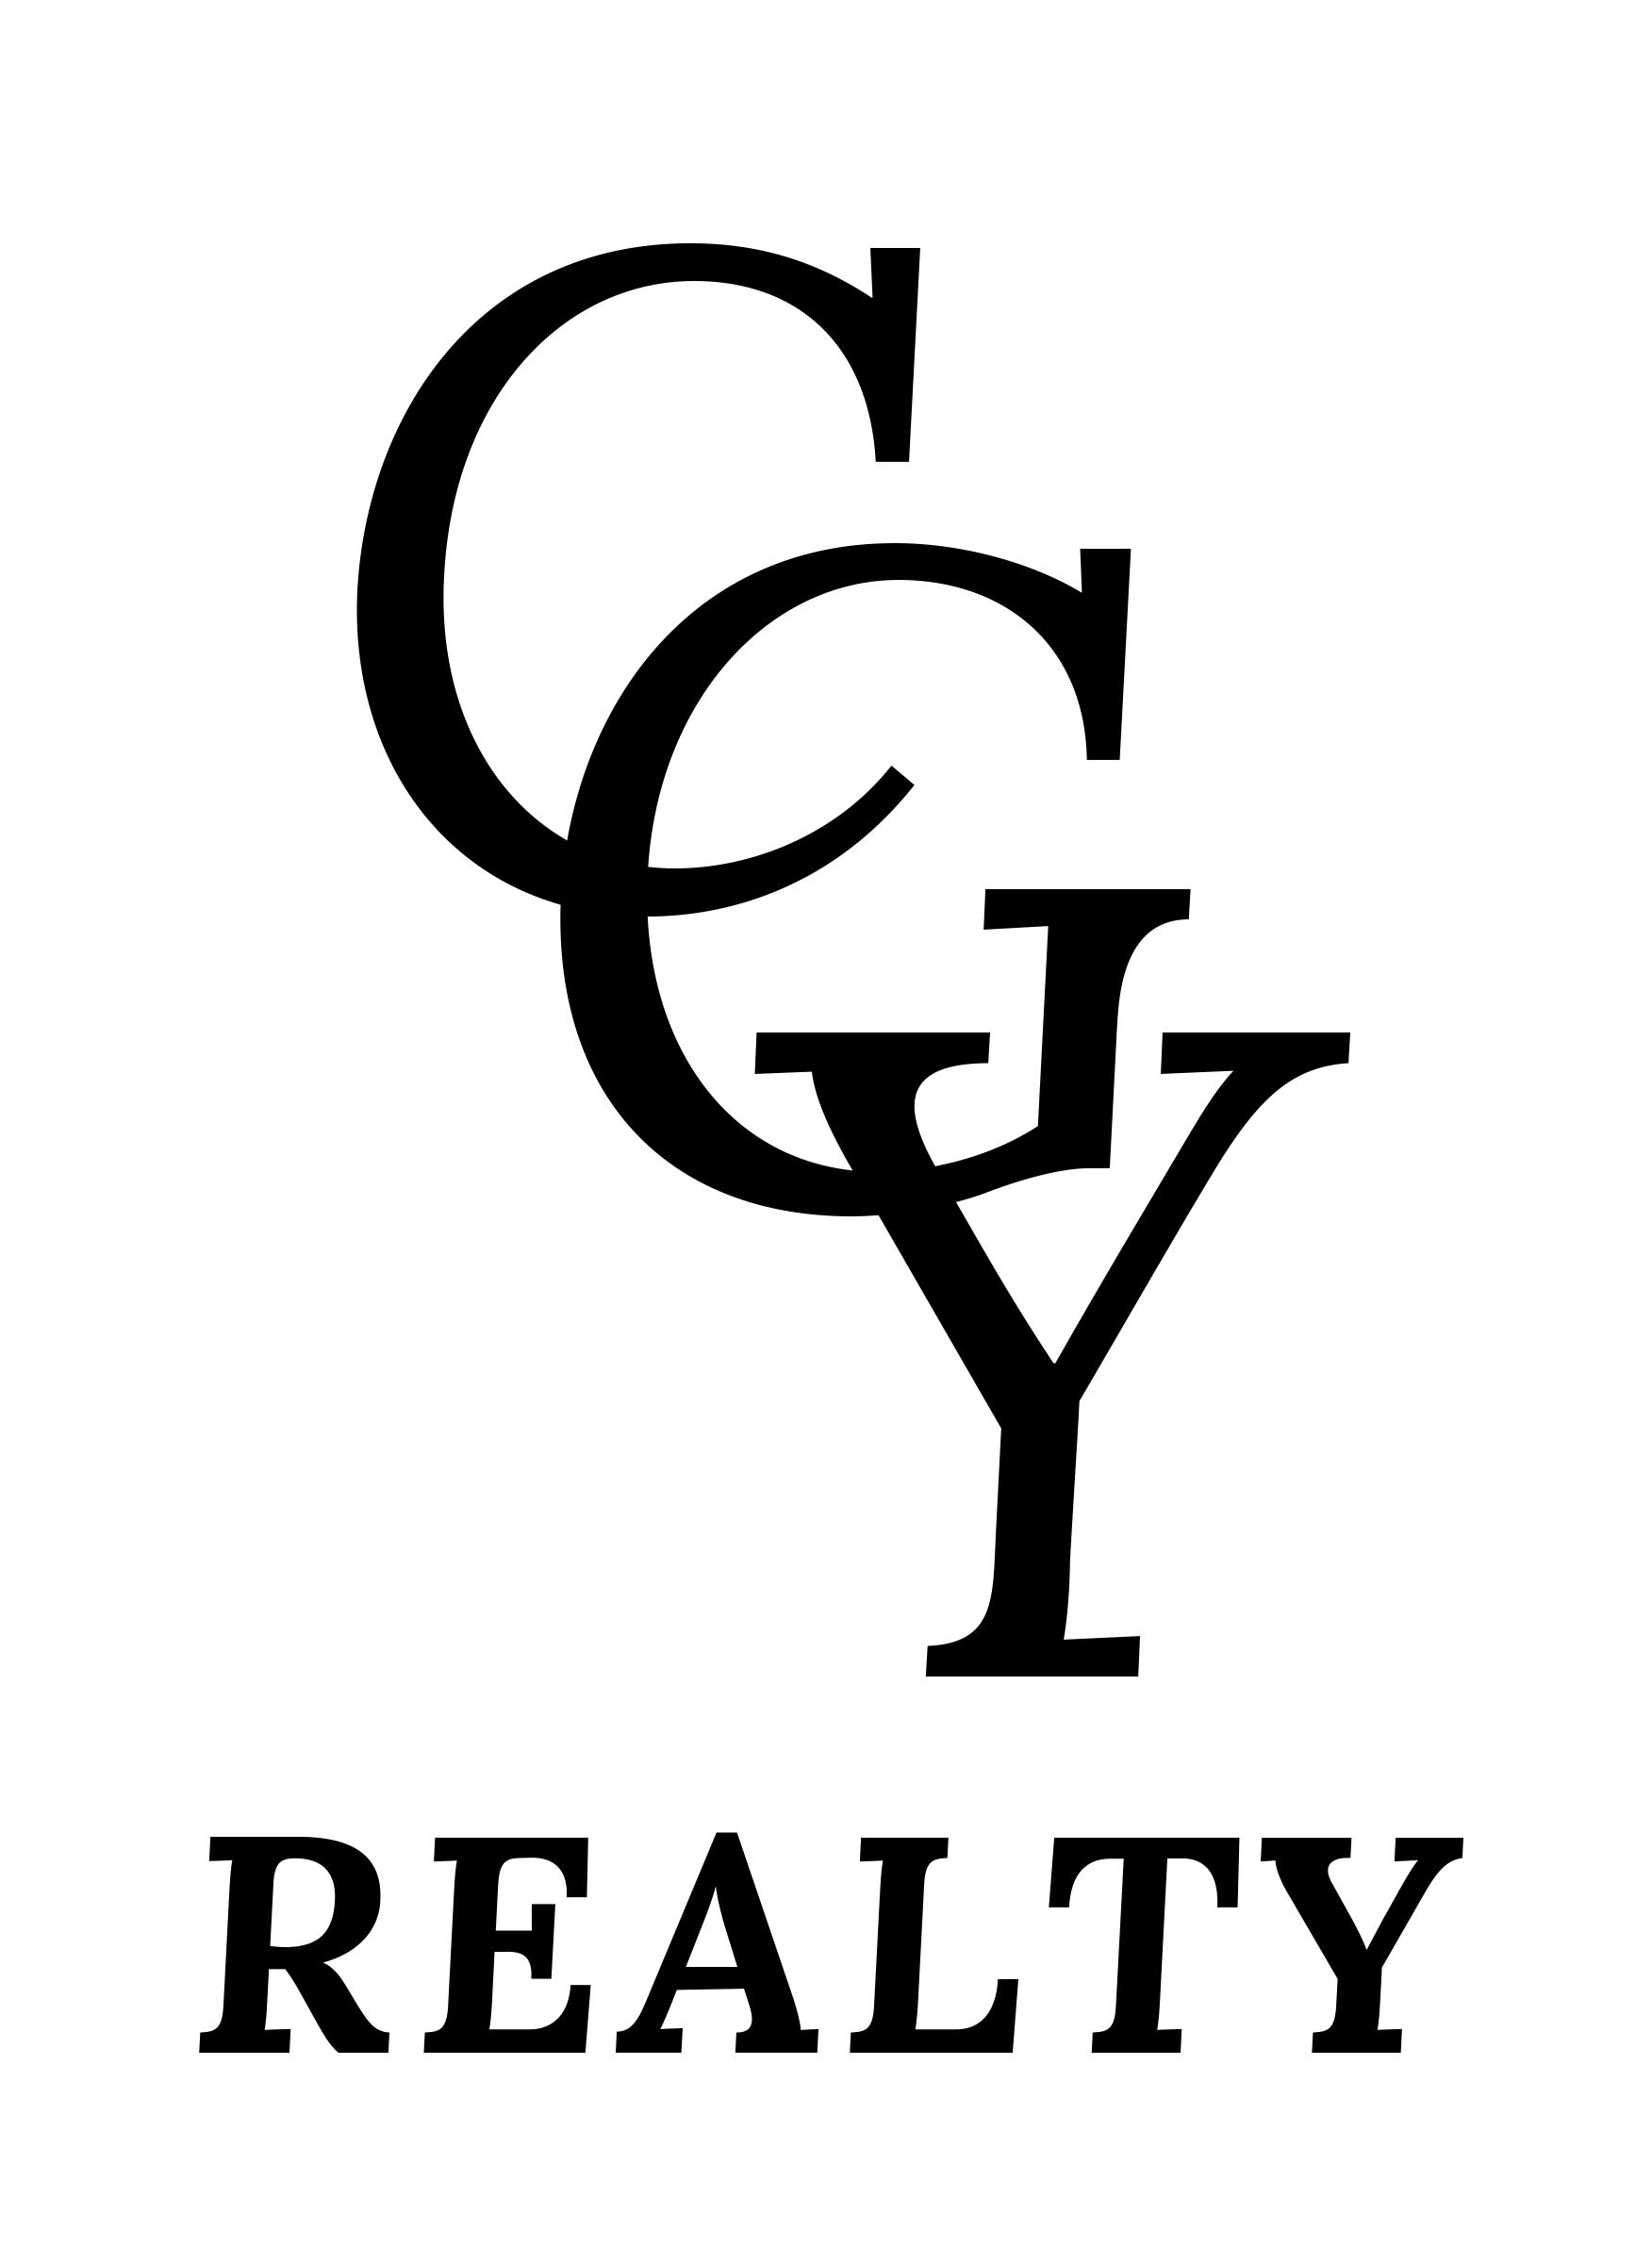 CGY Realty